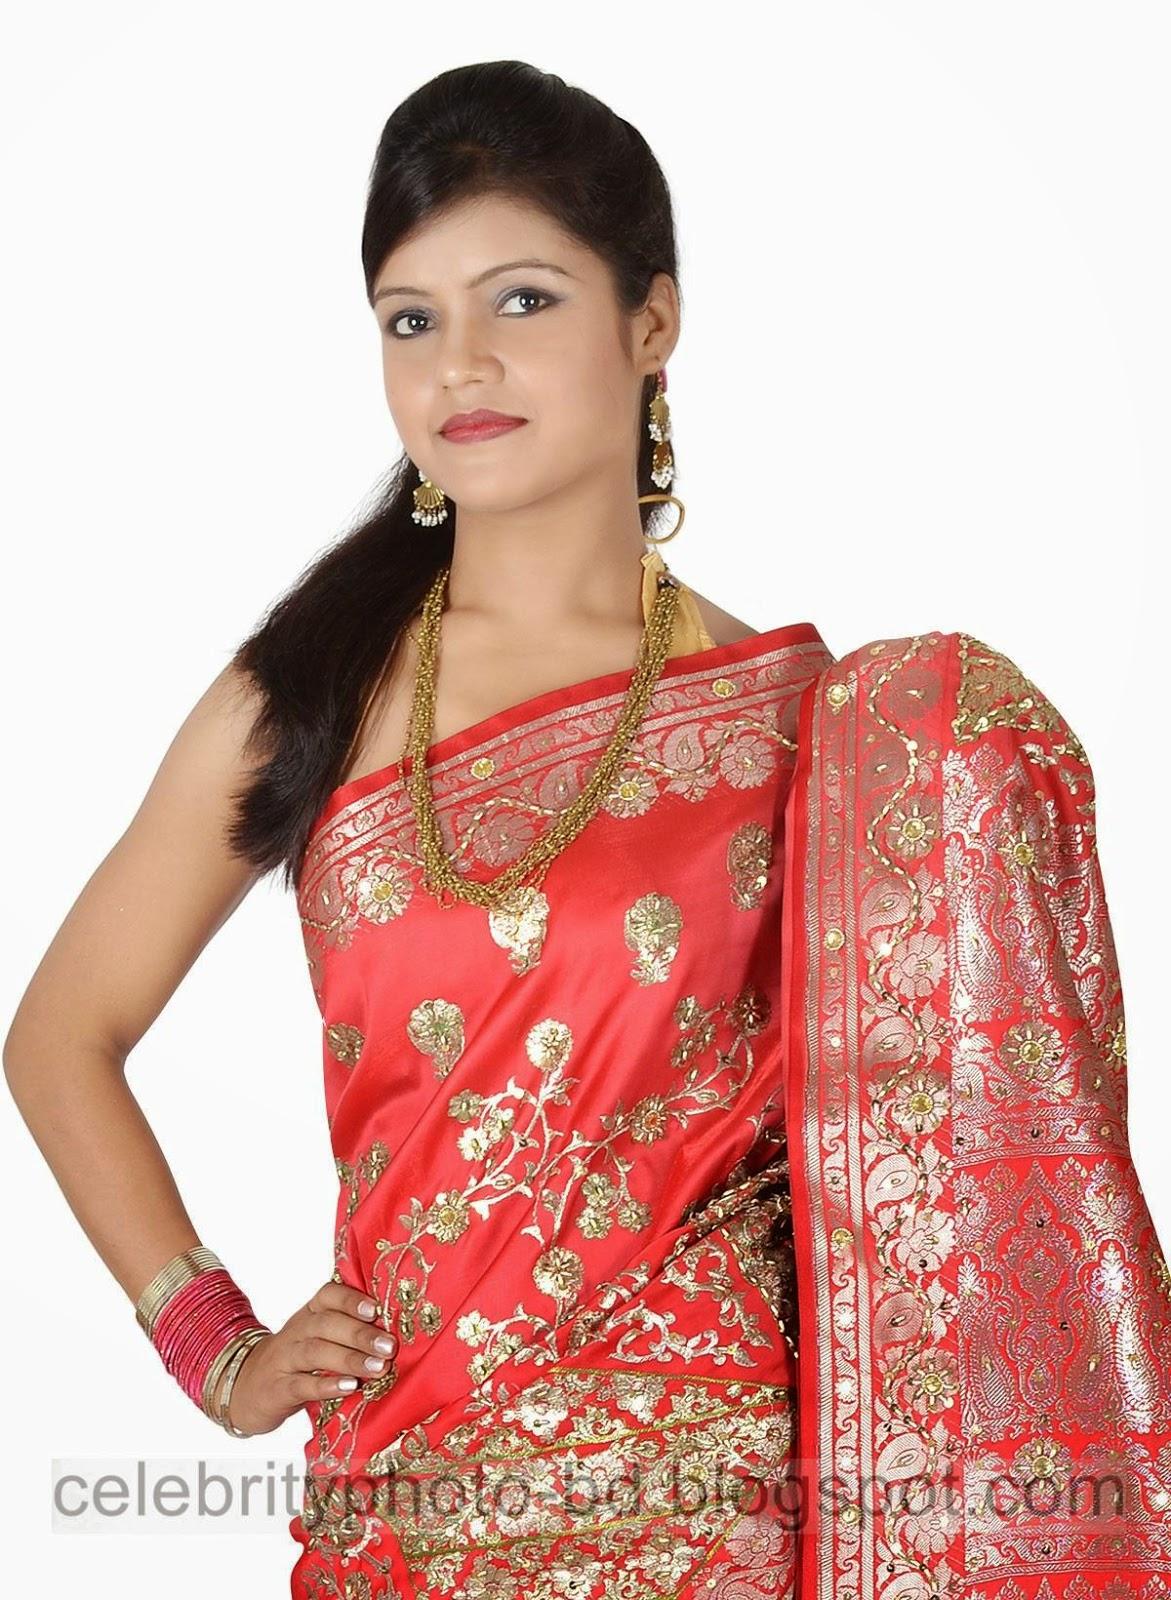 Indian%2BGirls%2B%26%2BLadies%2BIn%2BNight%2BParty%2BPink%2BBanarasi%2Bsilk%2Bsarees003